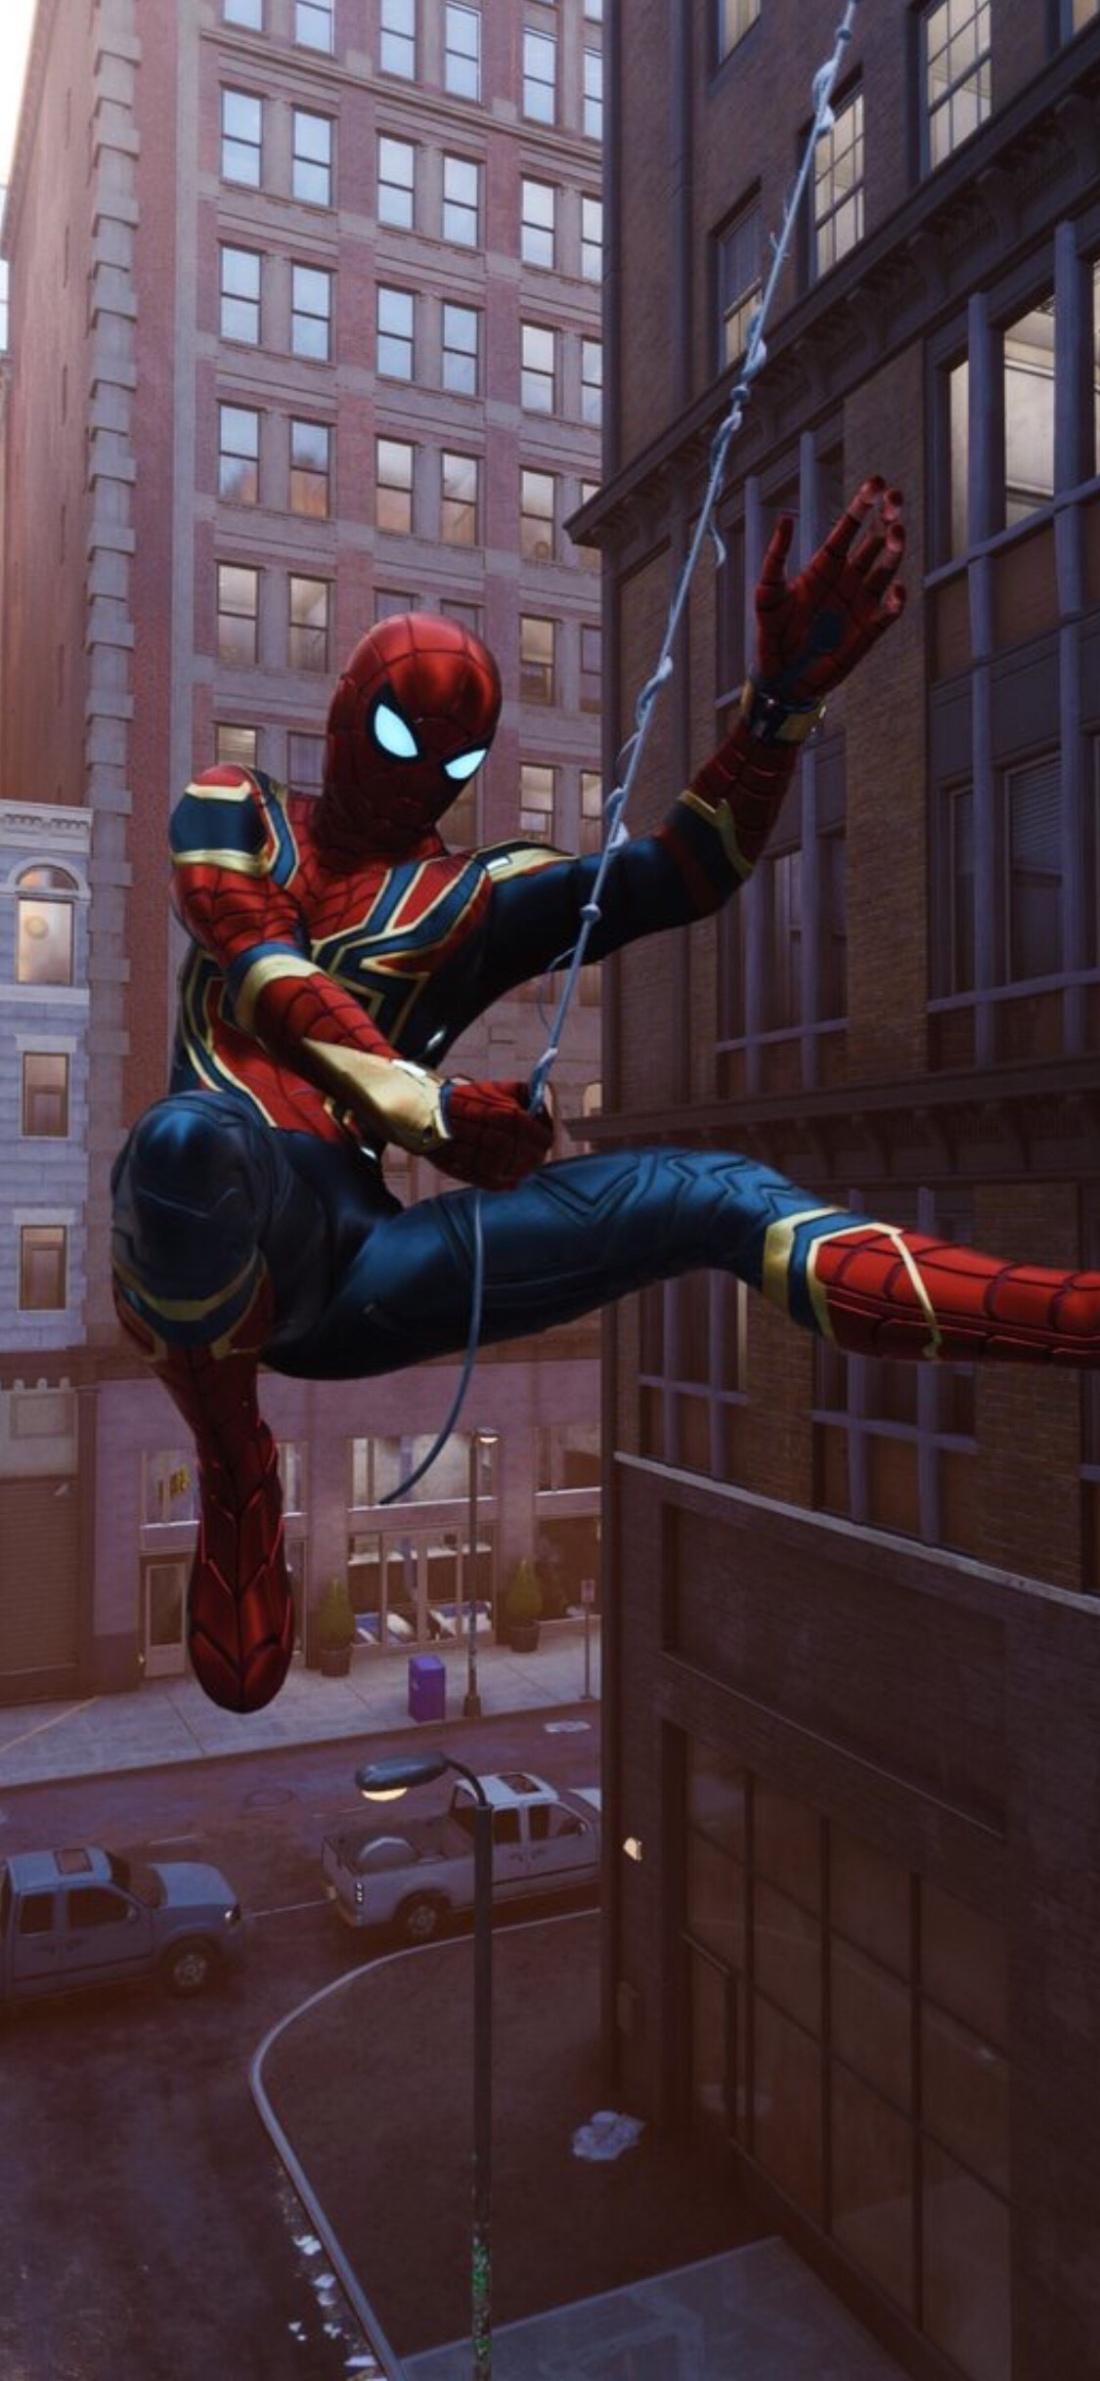 Spider Man Iphone X Wallpapers Lee Peterson Ljpuk